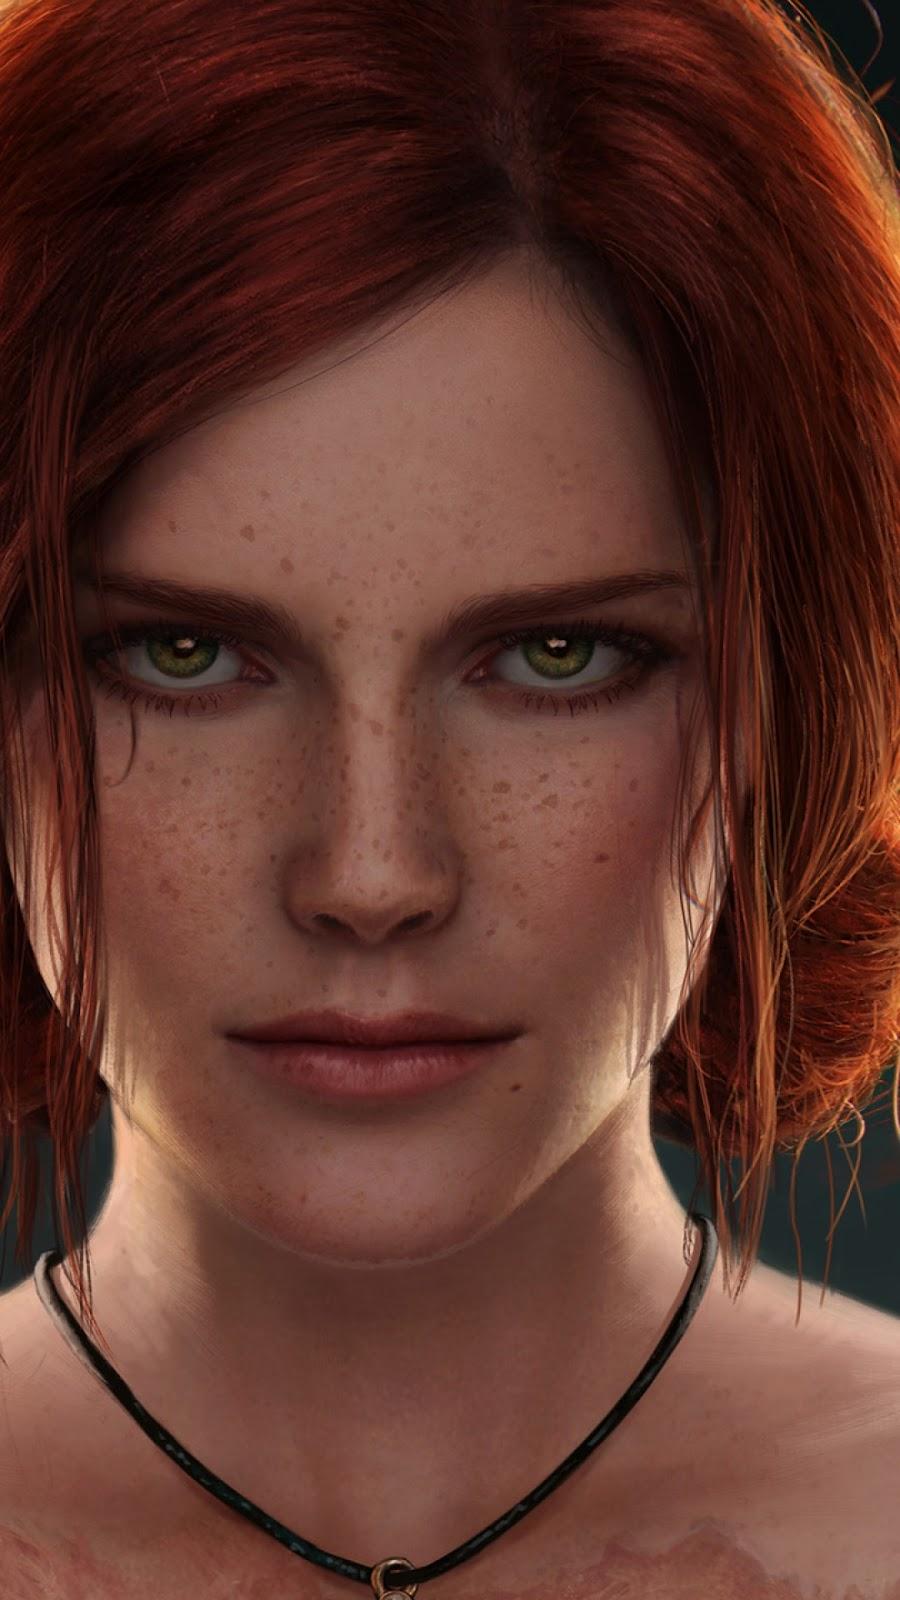 Papel de parede grátis Triss Merigold The Witcher para PC, Notebook, iPhone, Android e Tablet.